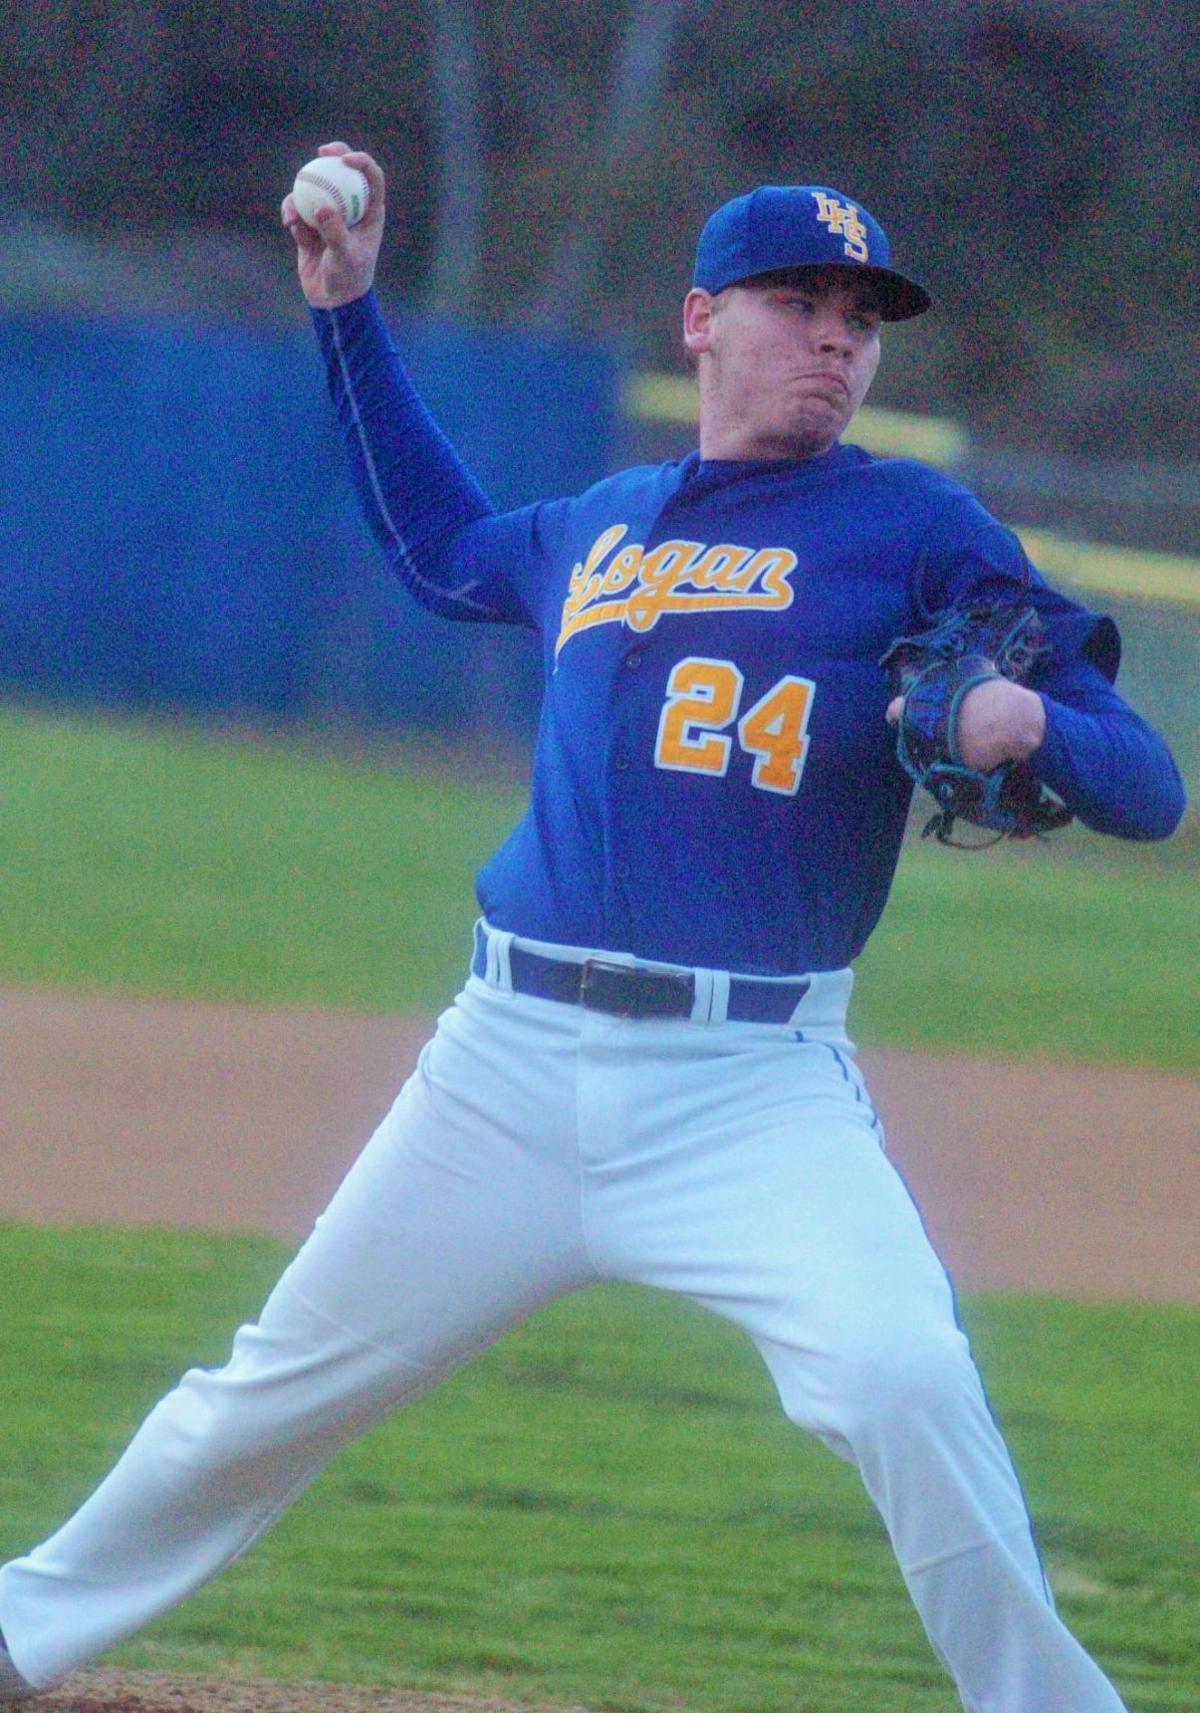 0412_LoganChapBaseball Dawson Beckett pitches